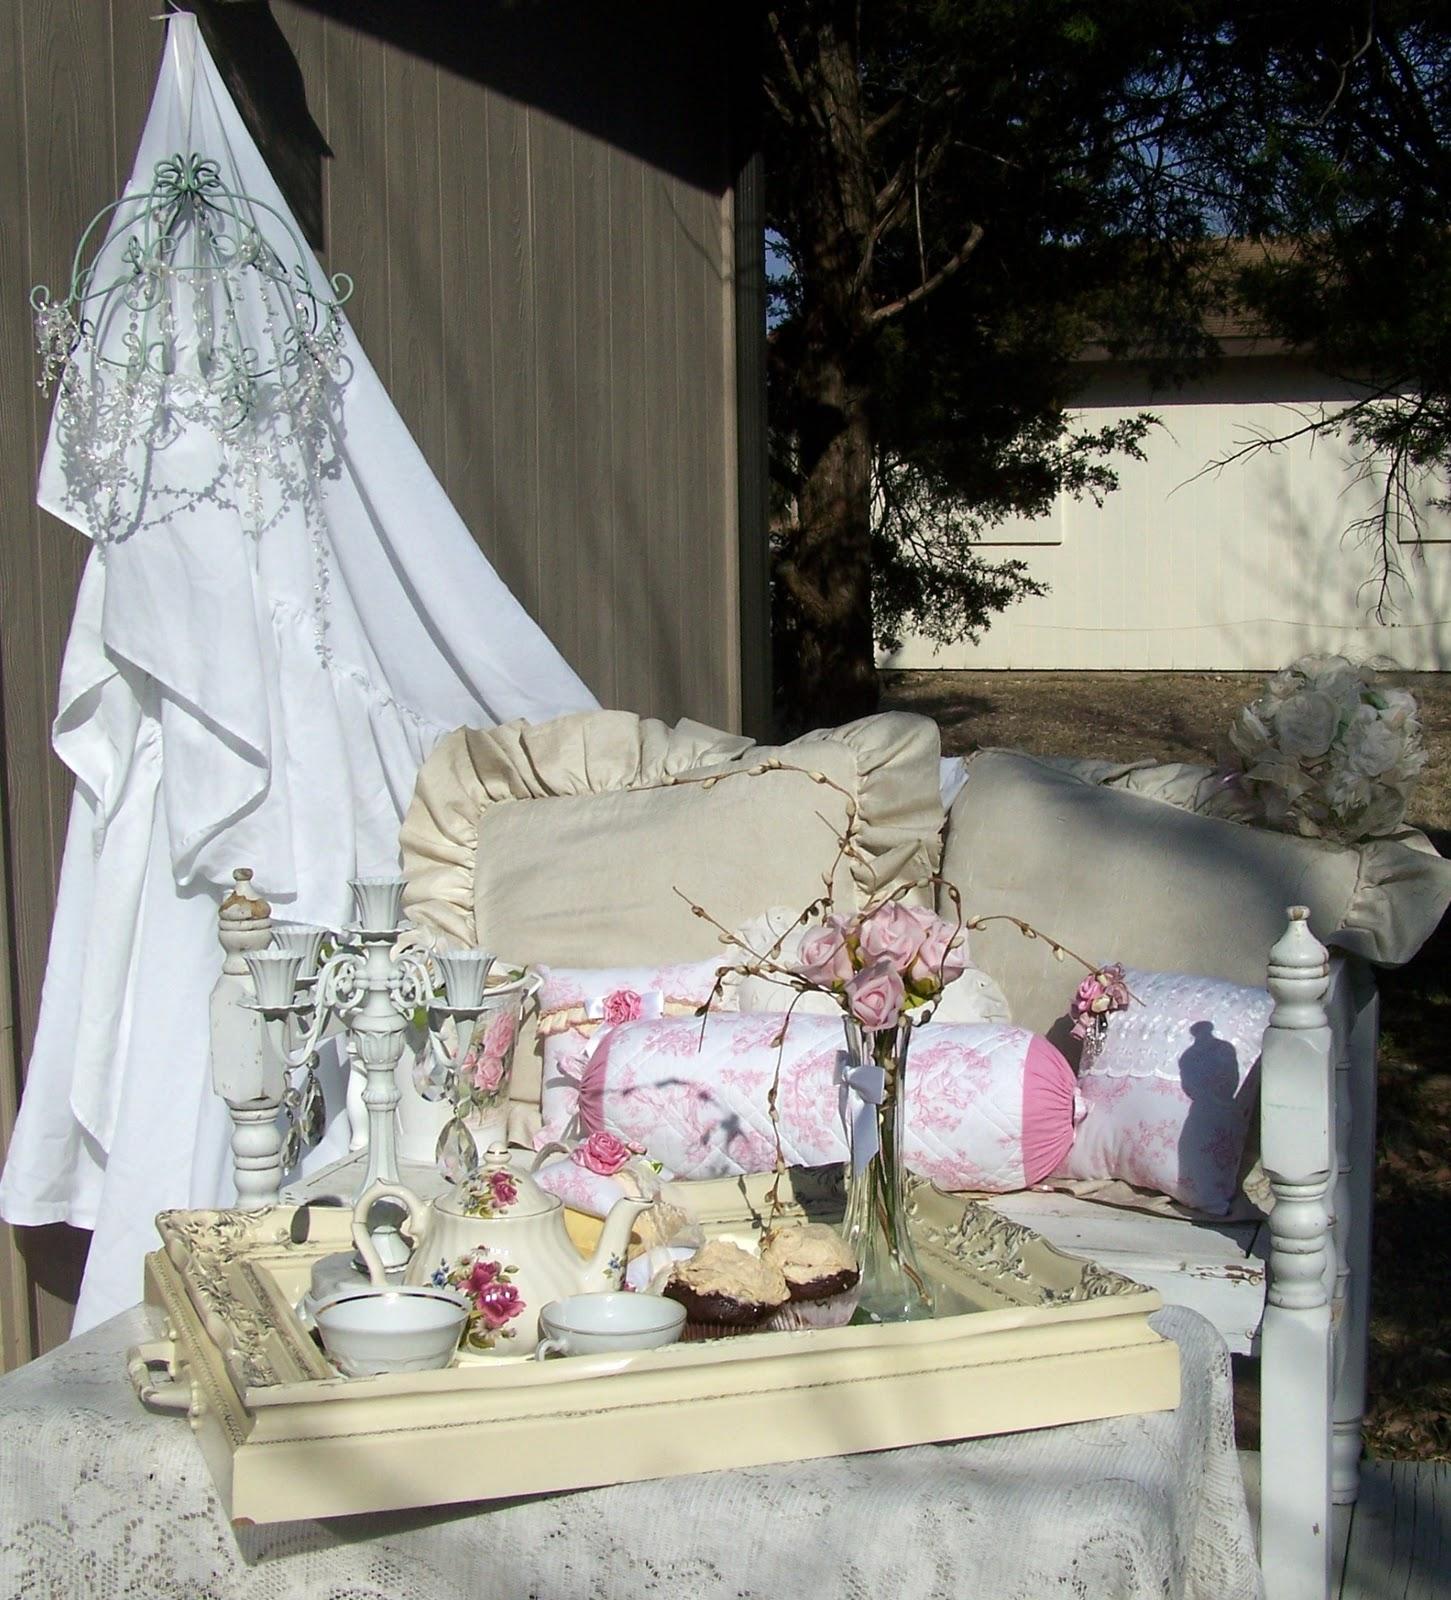 Olivia's Romantic Home: Tiny Romantic Porch